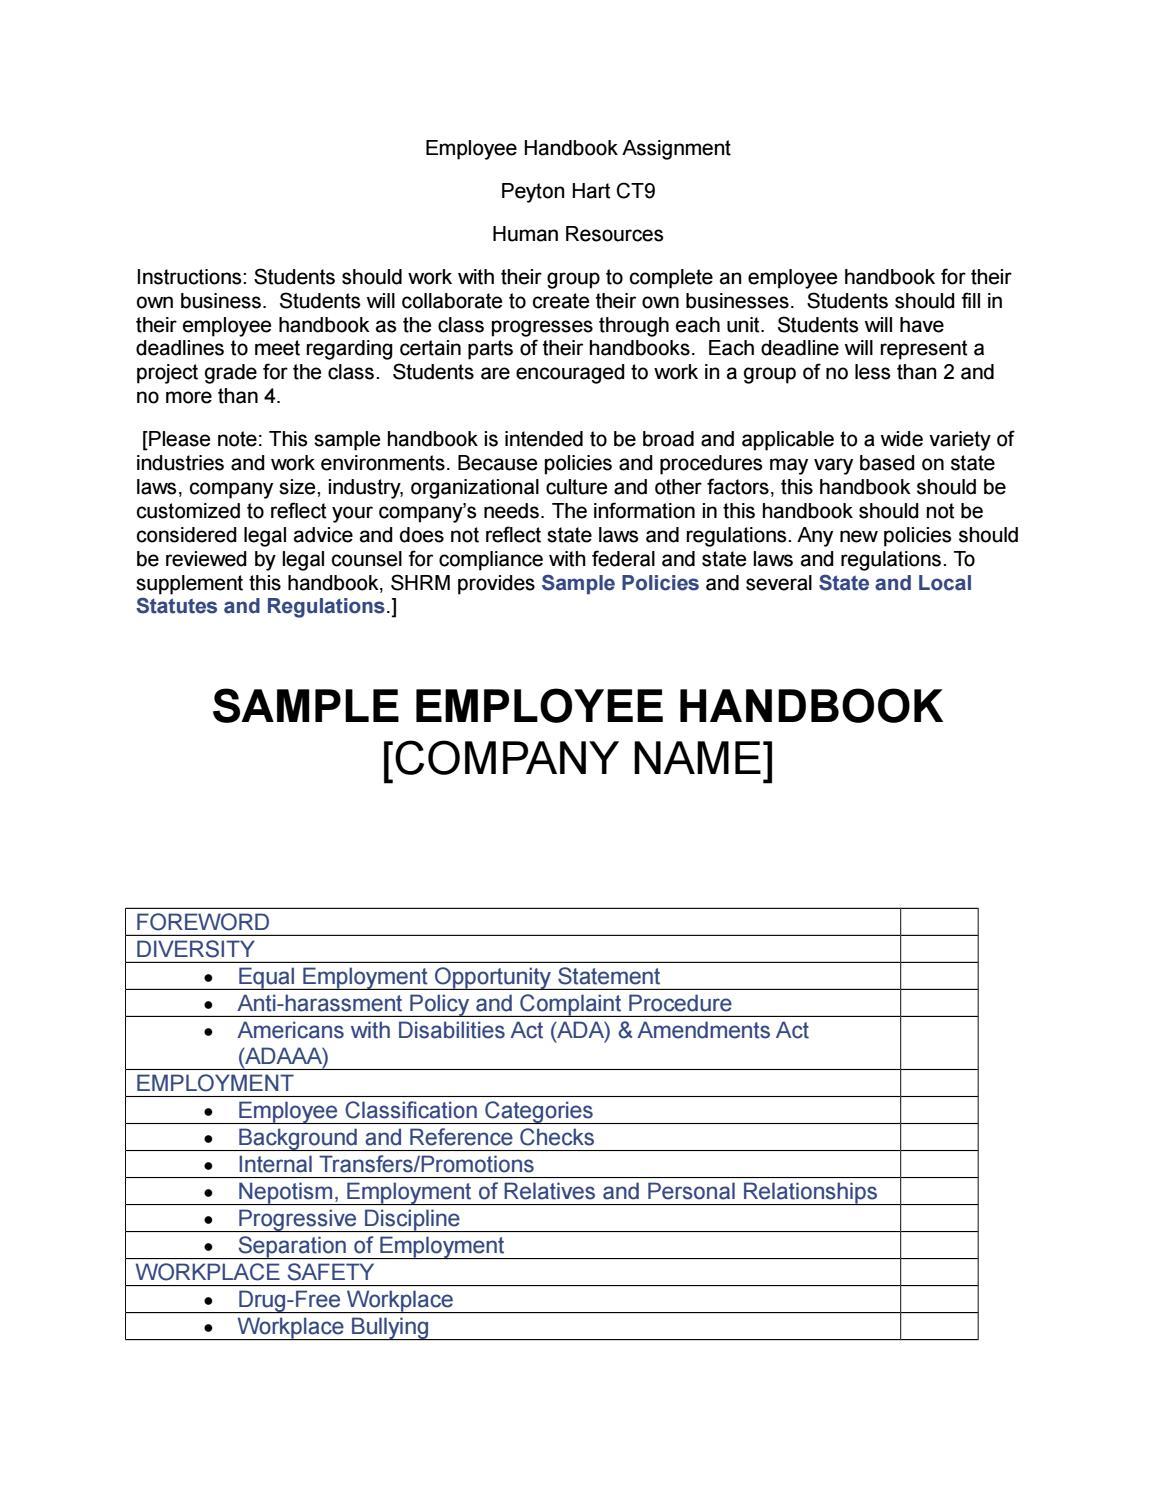 Employee Handbook Template By Peyton Hart Issuu